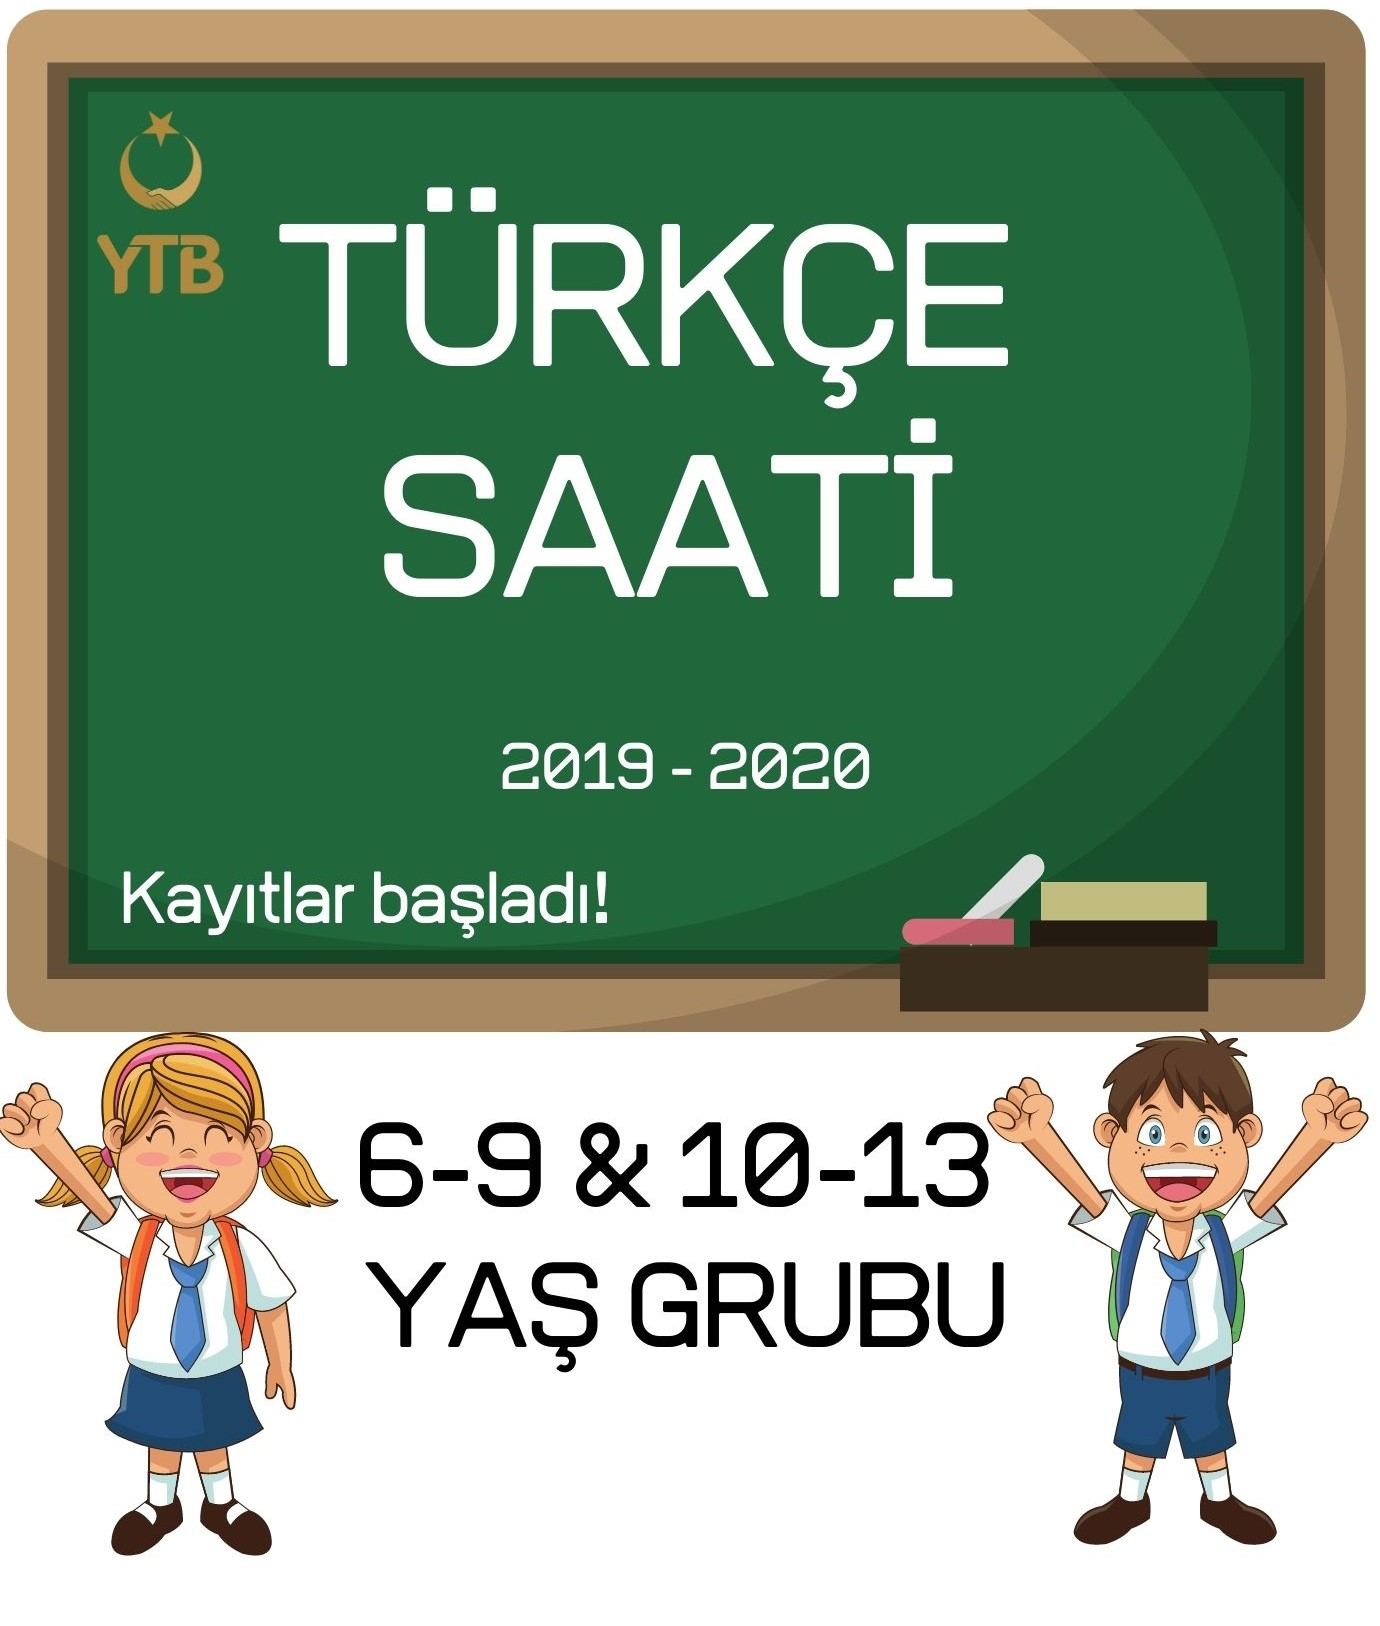 Türkçe saati Projesi